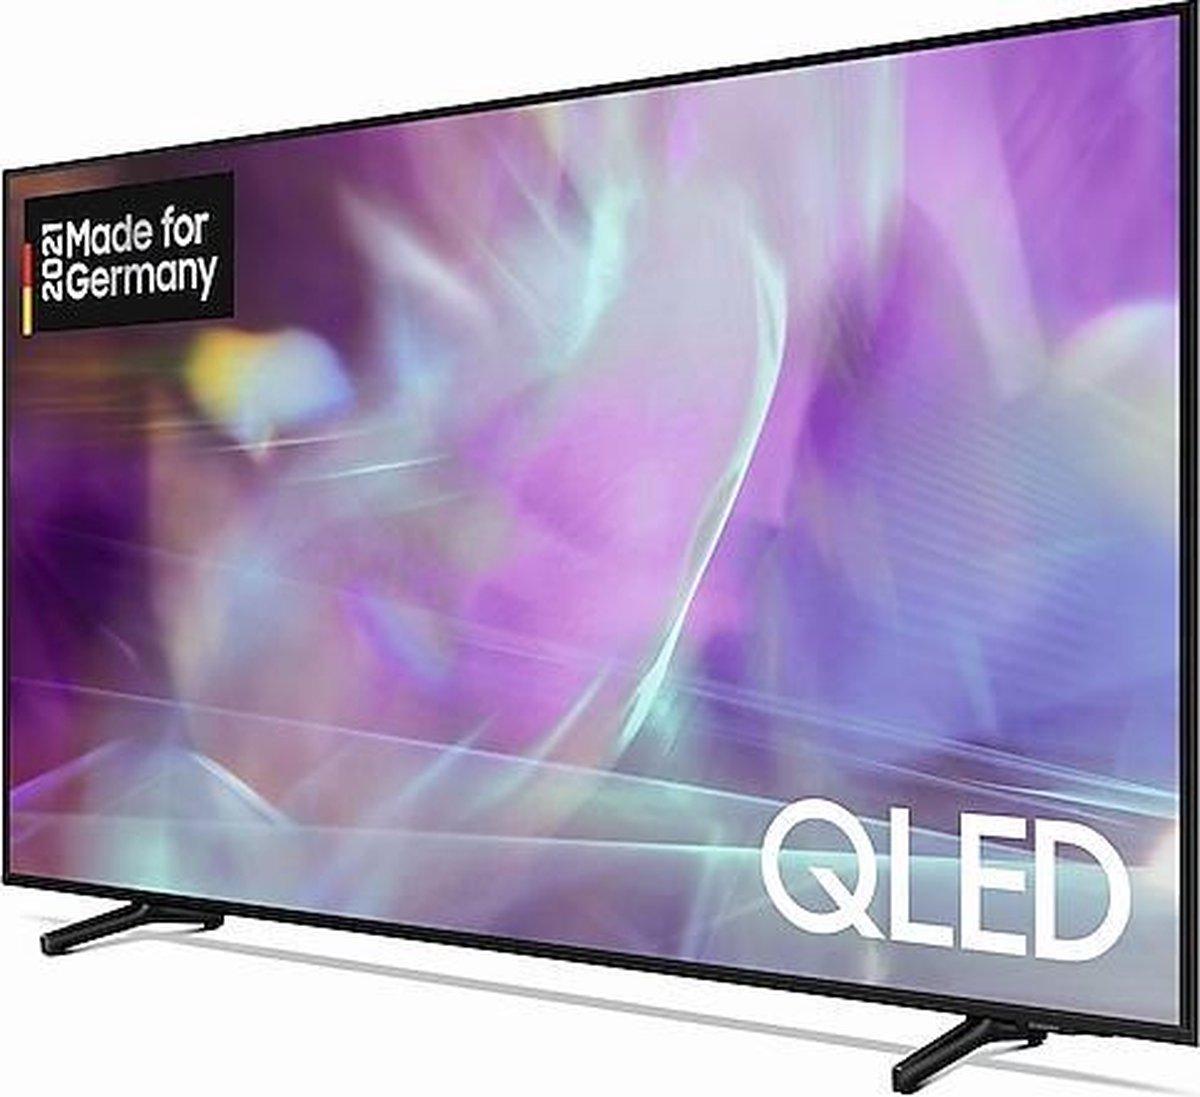 Samsung Series 6 GQ43Q60A - 4K Smart TV (Europees Model)